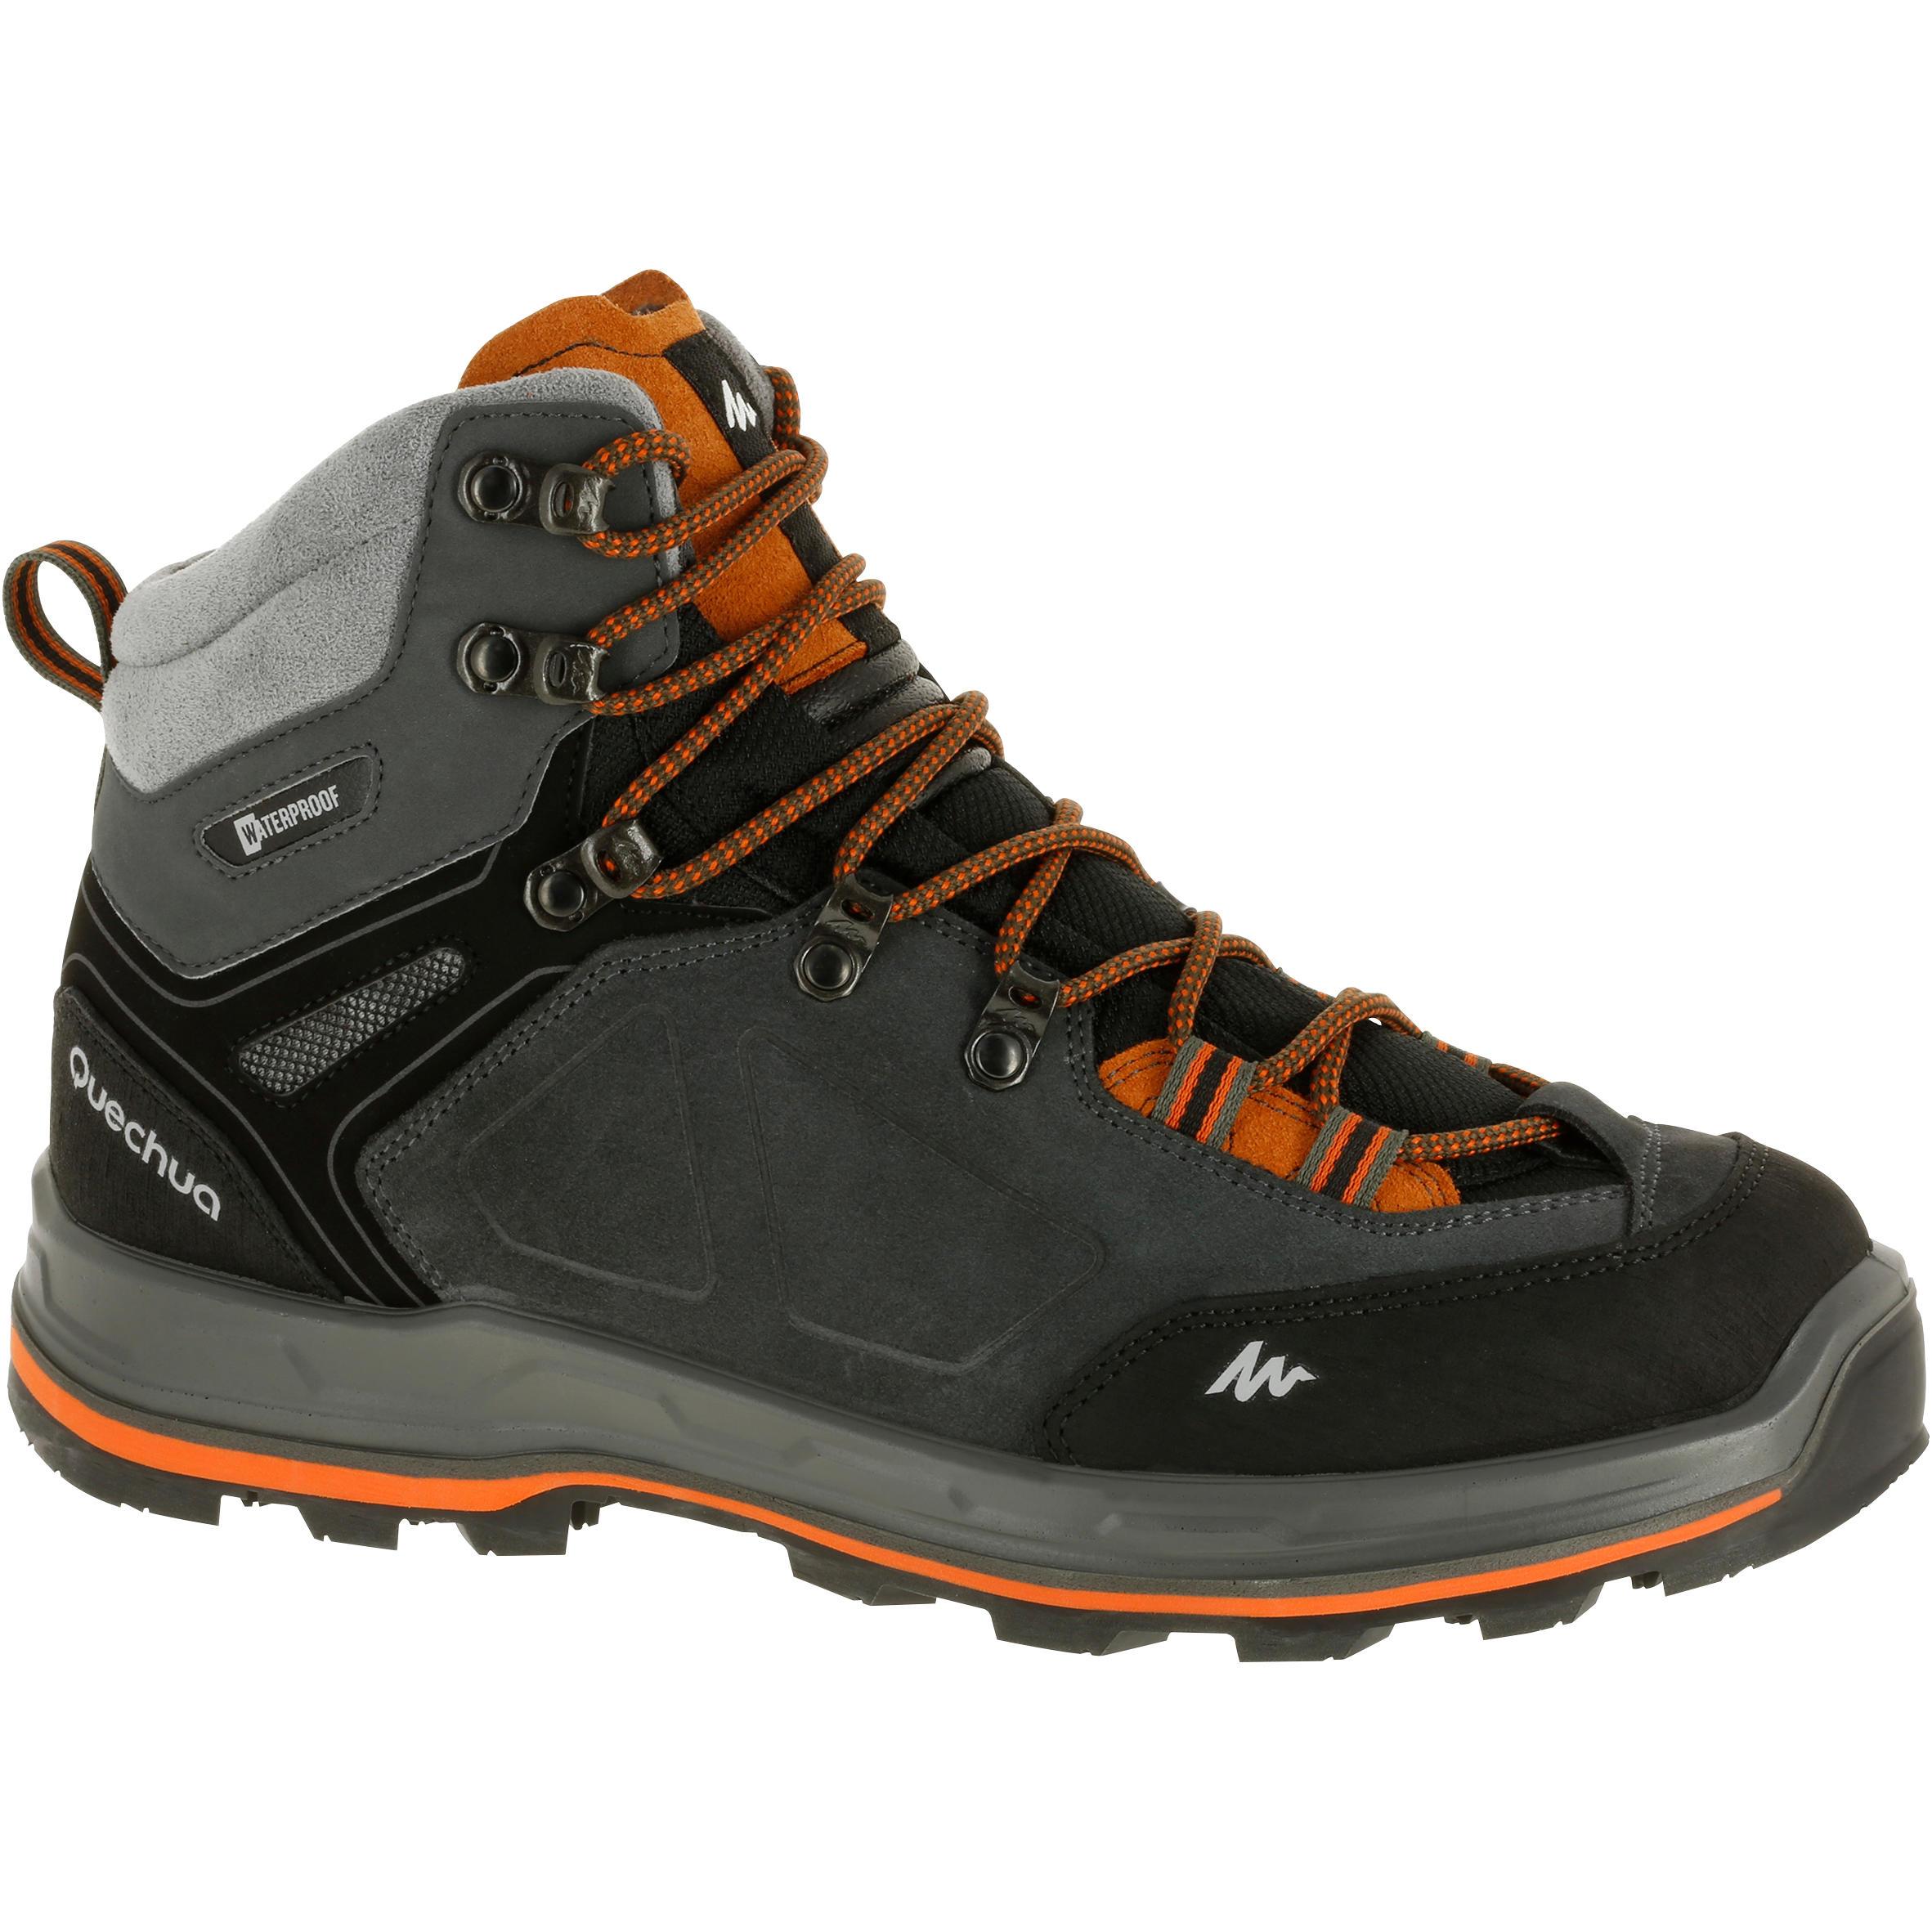 Trek 100 Hiking Boots - Men - Decathlon